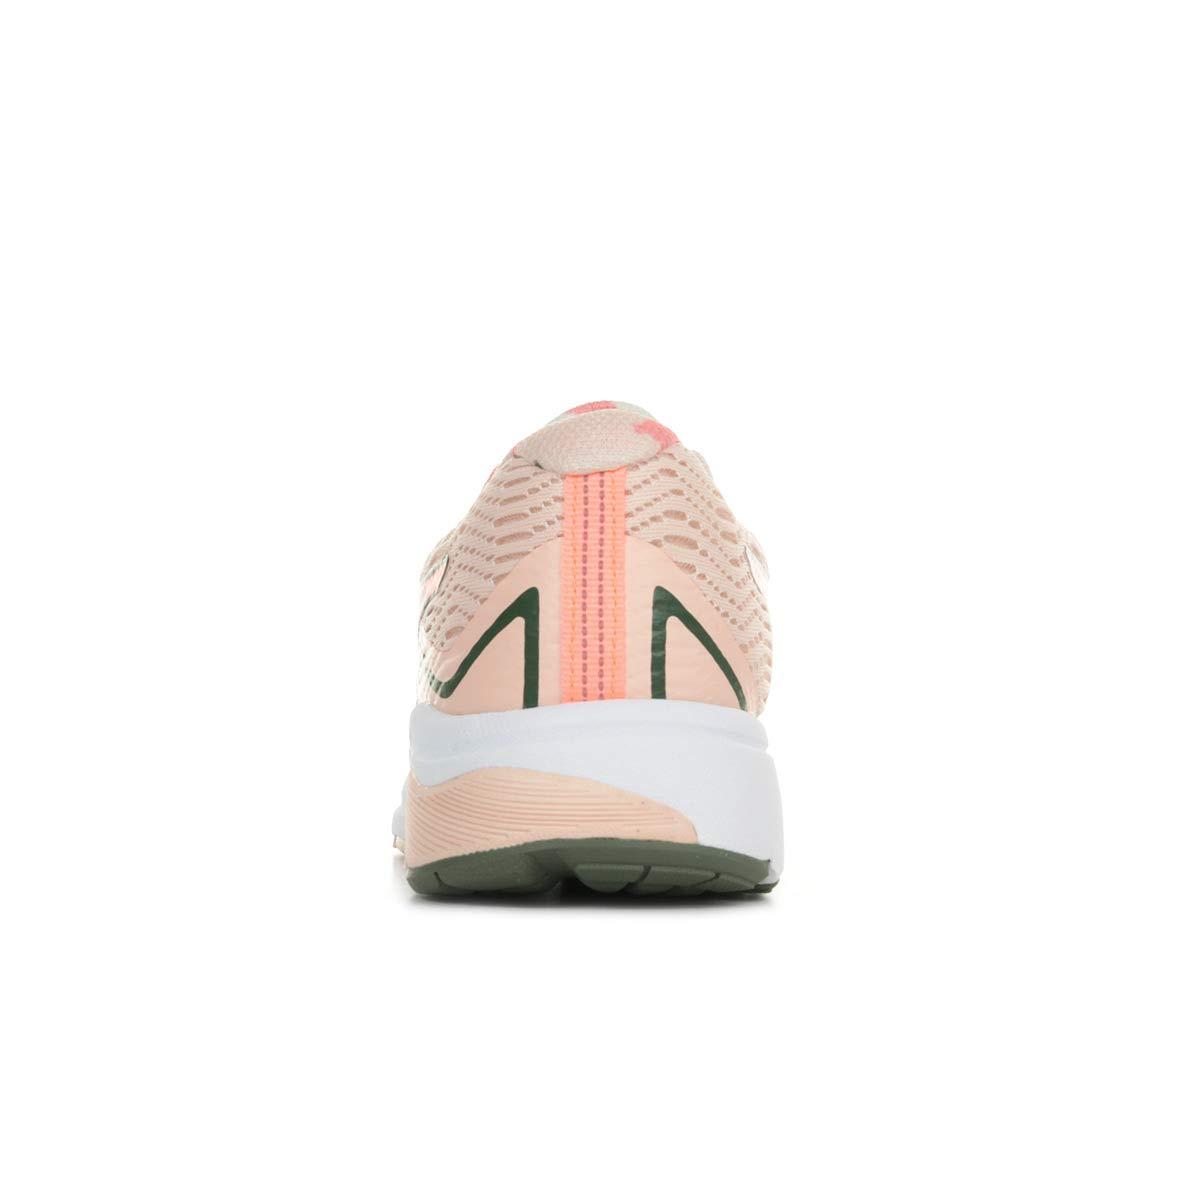 ASICS Chaussures Junior Gt-1000 8 SP